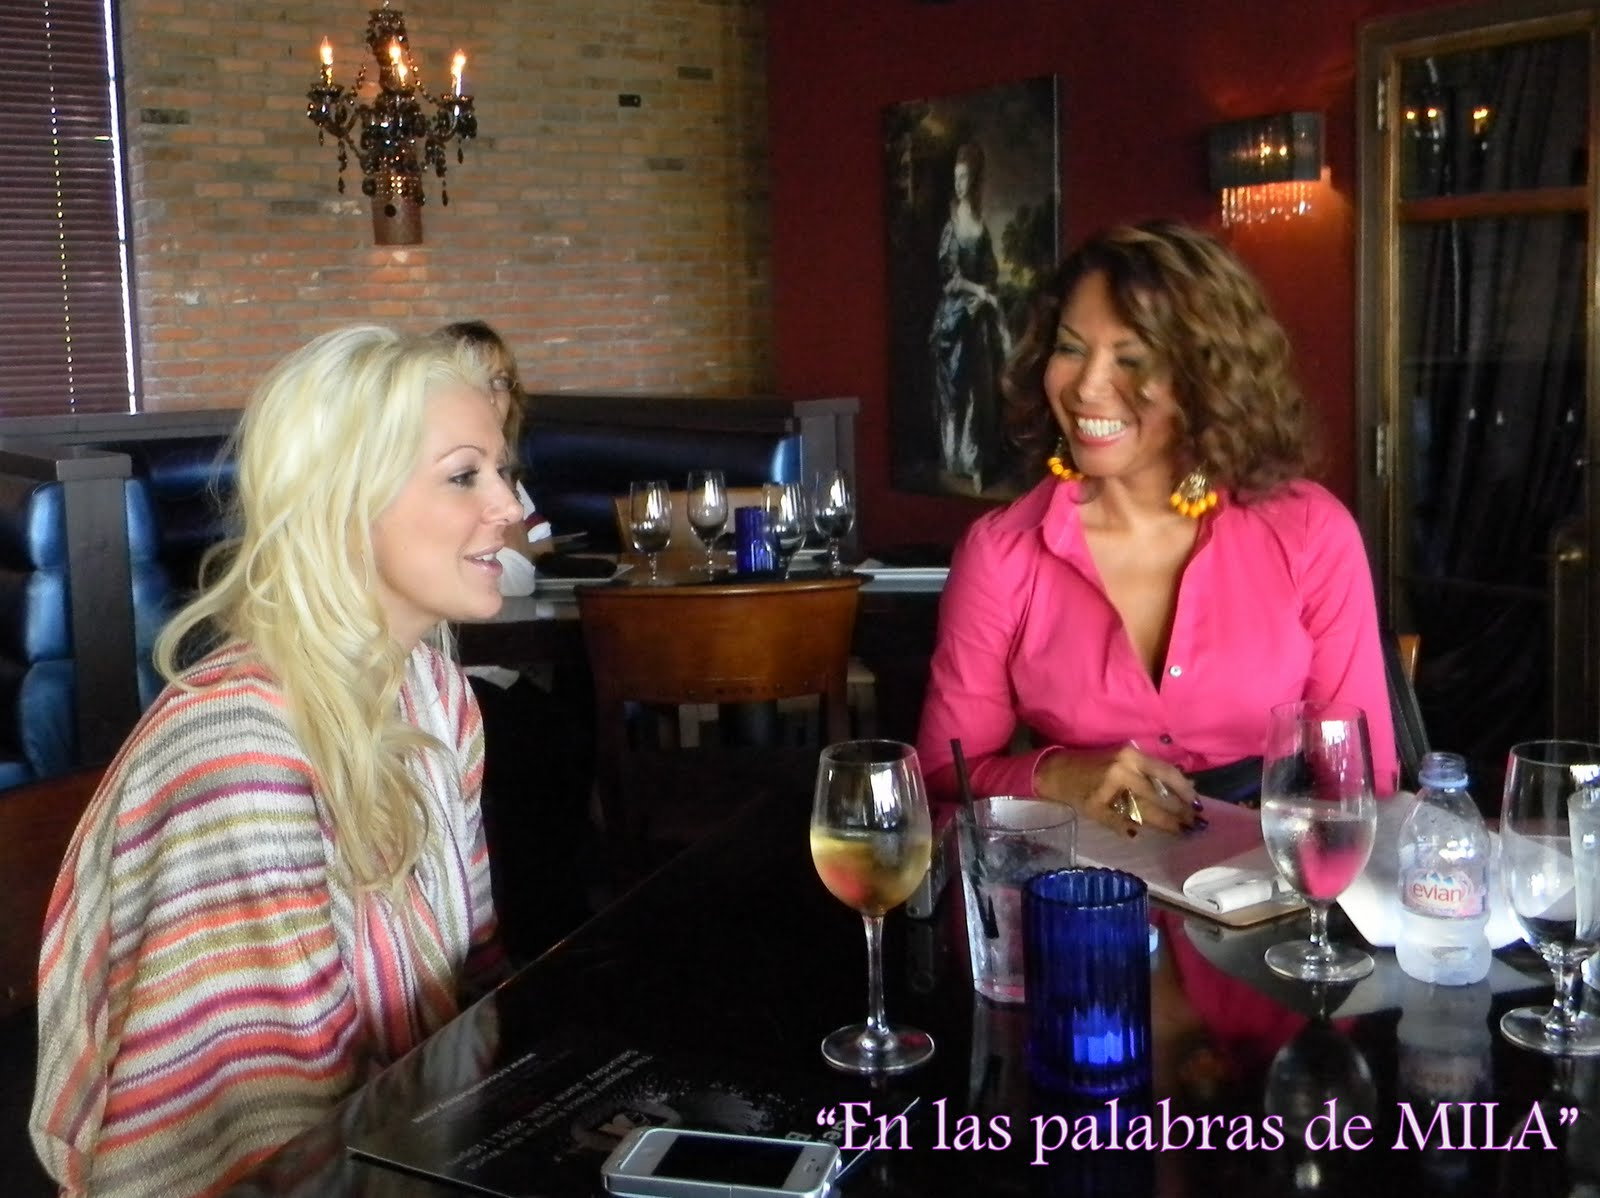 http://1.bp.blogspot.com/-ZbjI3OkBgWI/Te-ZvN3BqrI/AAAAAAAACS8/a-yX4Oh084w/s1600/kaitie+carzola+053.JPG